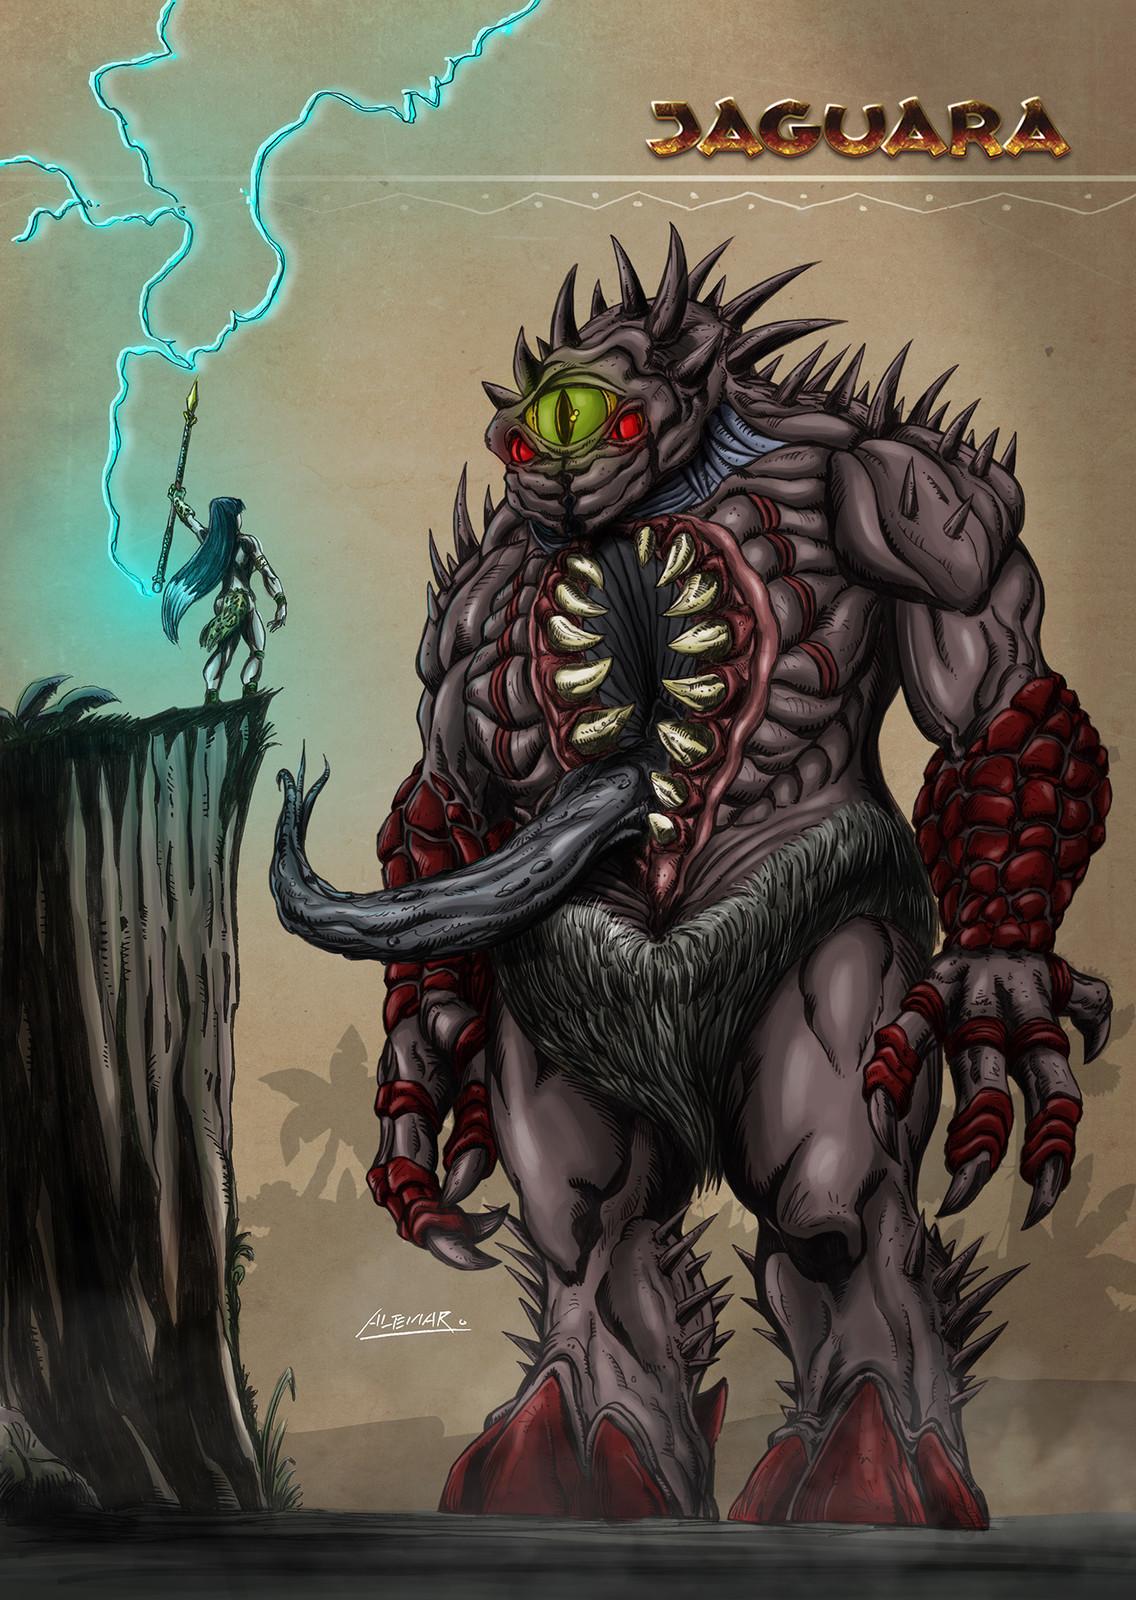 Mapinguari - The most powerful and bigger creature Jaguara has ever faced